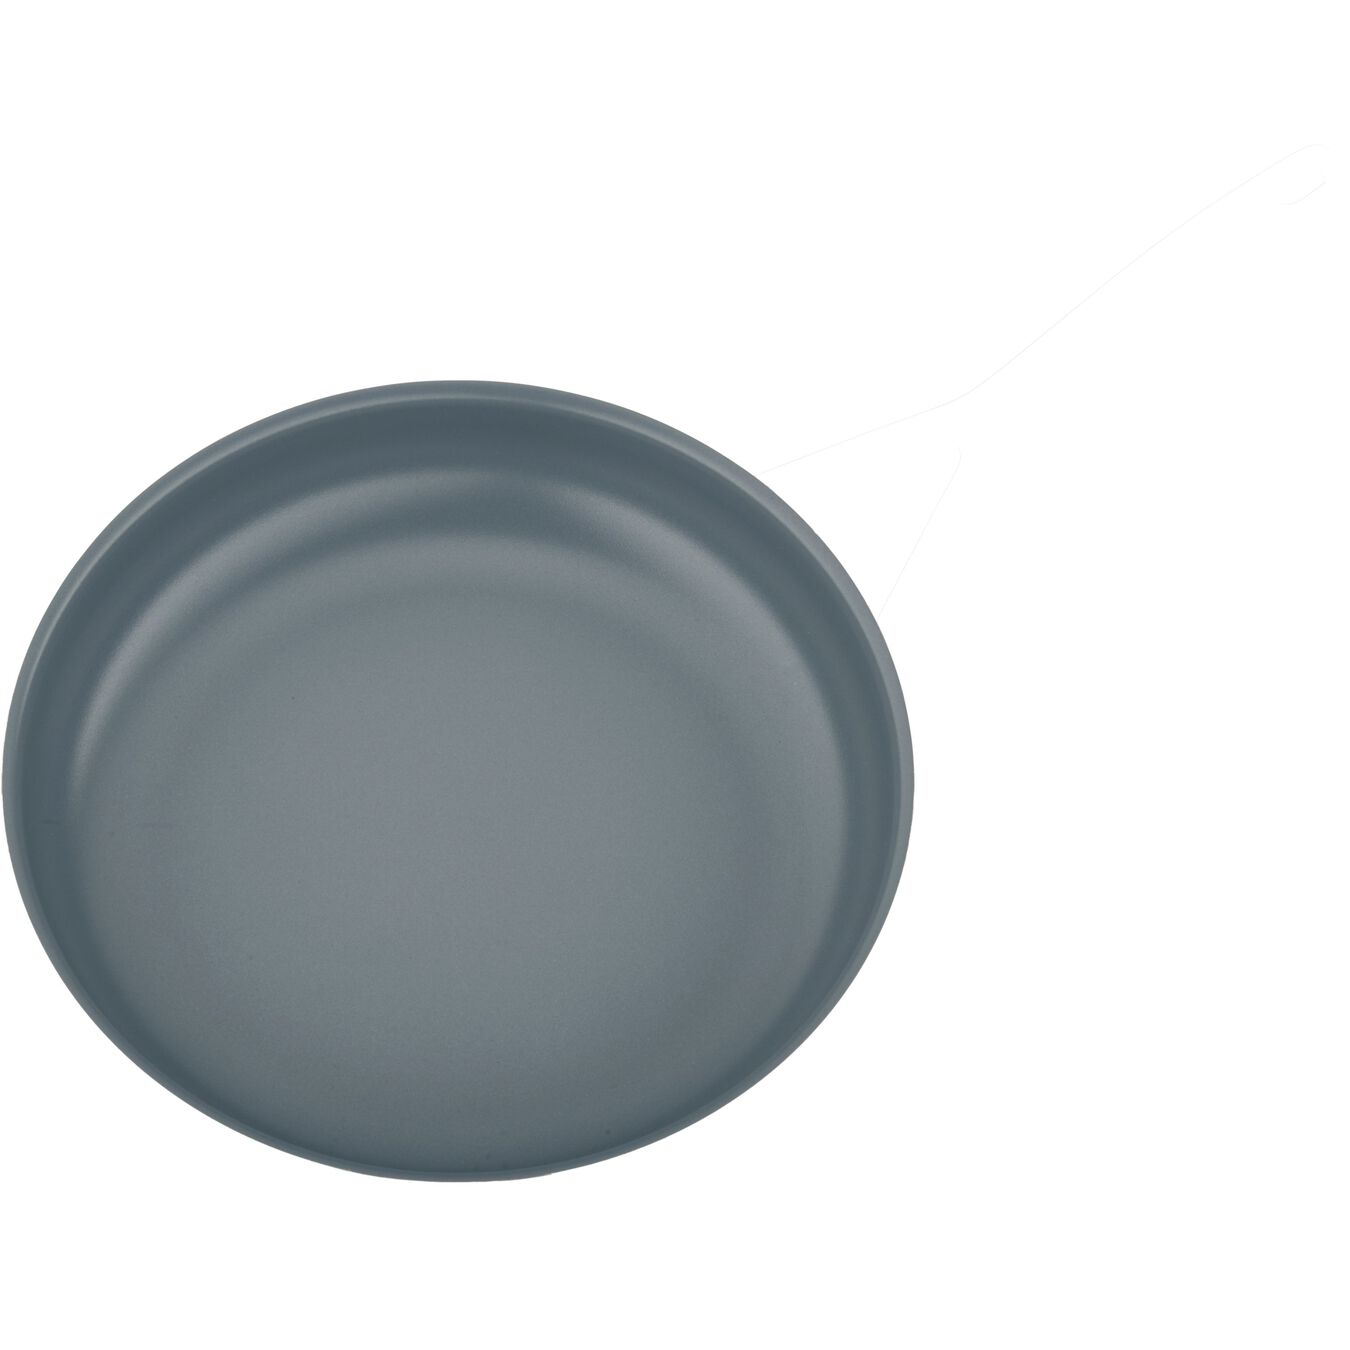 Bratpfanne 28 cm, 18/10 Edelstahl, Silber,,large 4